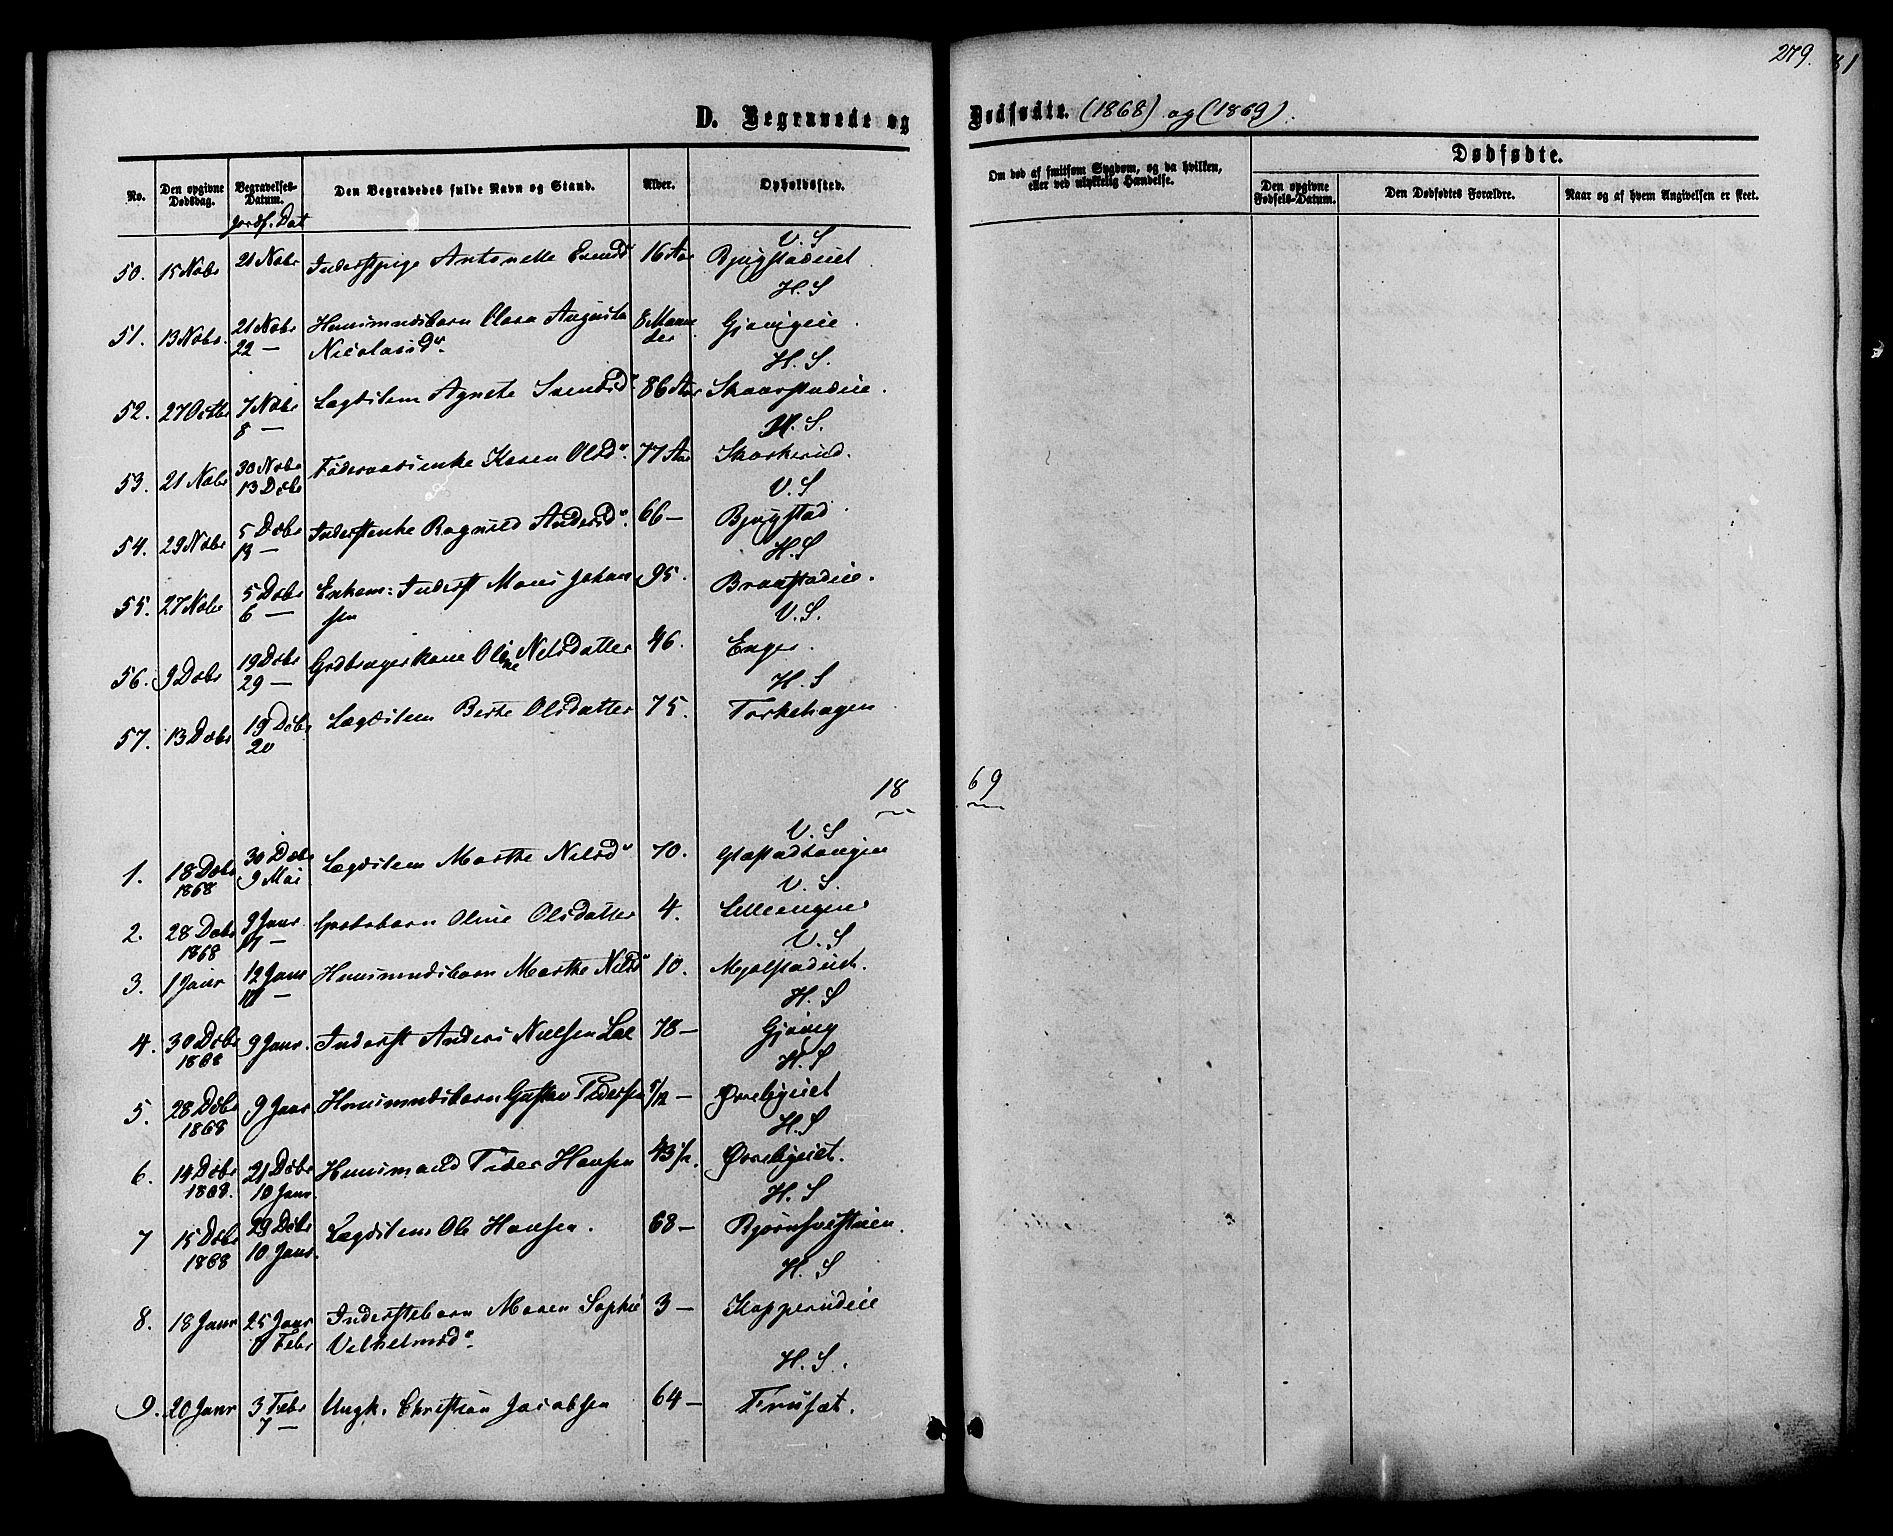 SAH, Vardal prestekontor, H/Ha/Haa/L0007: Ministerialbok nr. 7, 1867-1878, s. 279